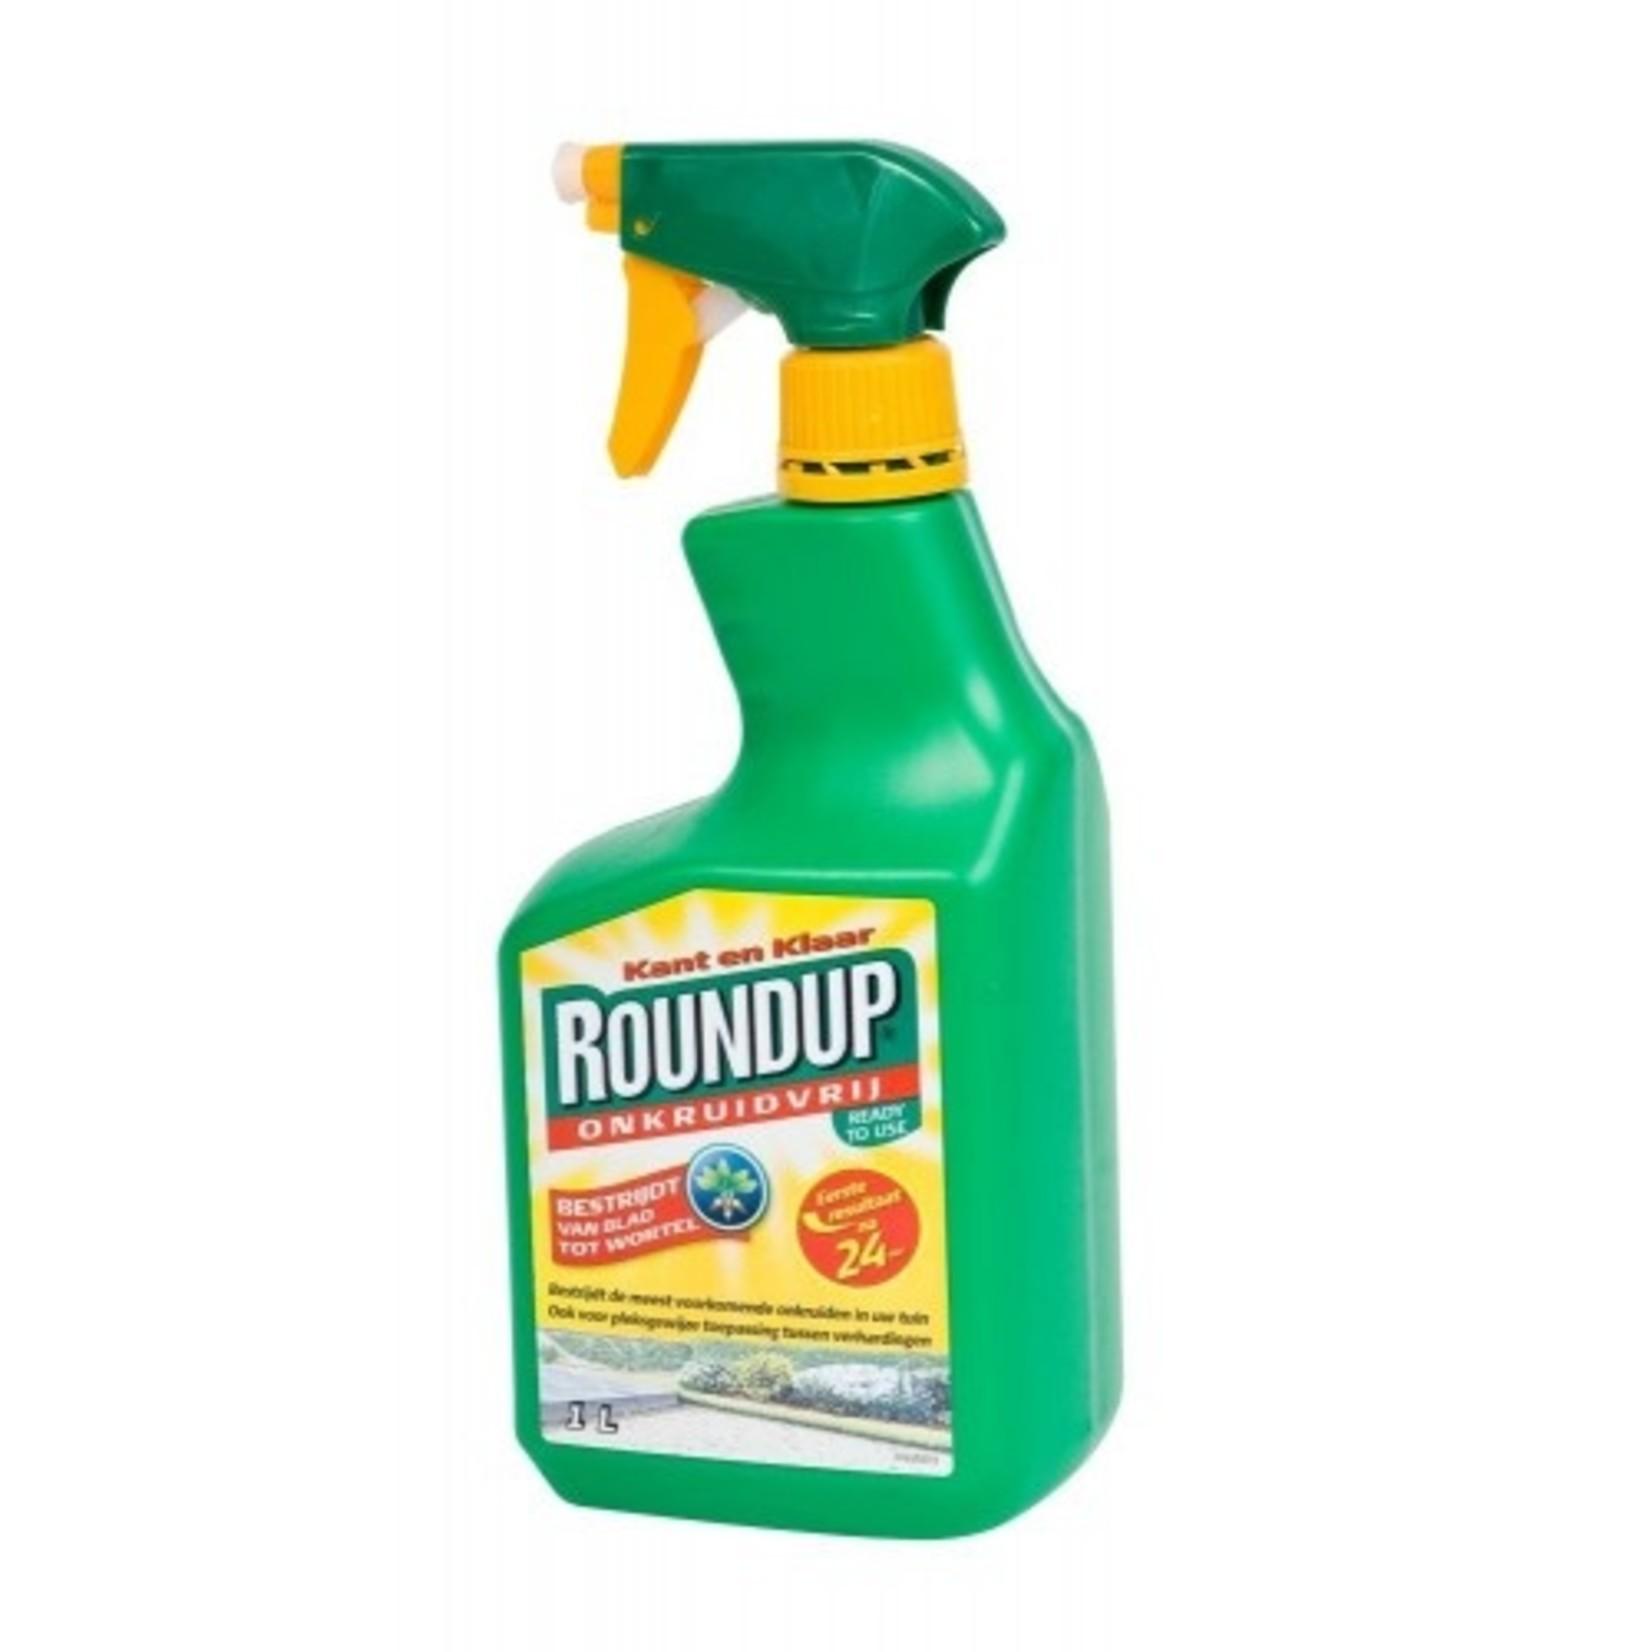 Round-up kant en klaar 1000 ml (spray) tegen onkruid